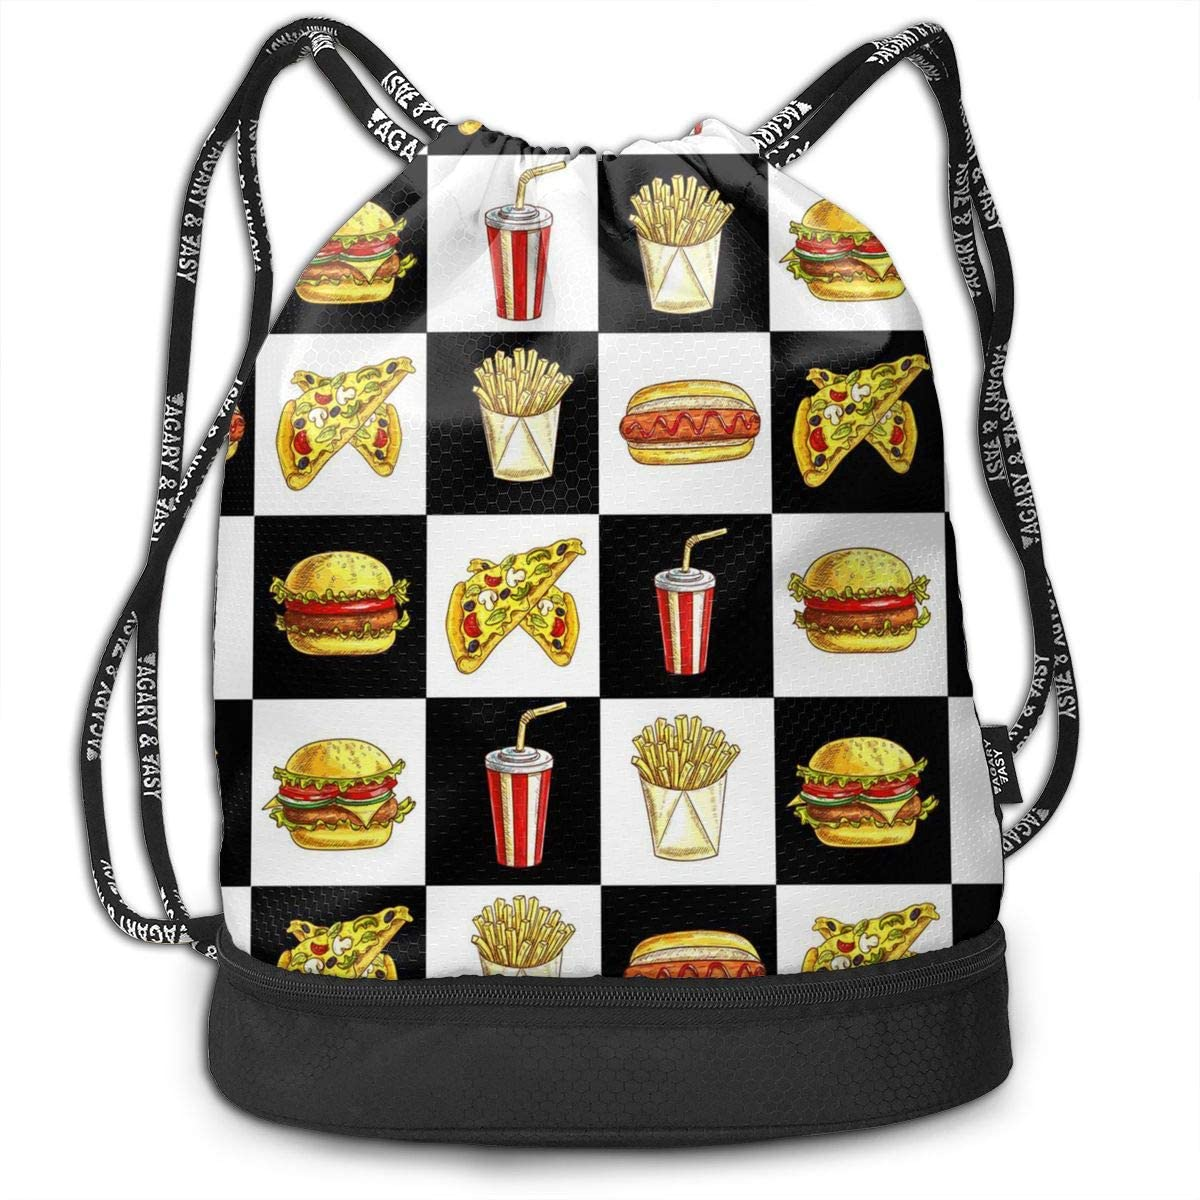 Bundle Backpacks Hamburger Hot Dog Fries Gym Sack Drawstring Bags Casual Daypack Yoga Bag School Training Pouch